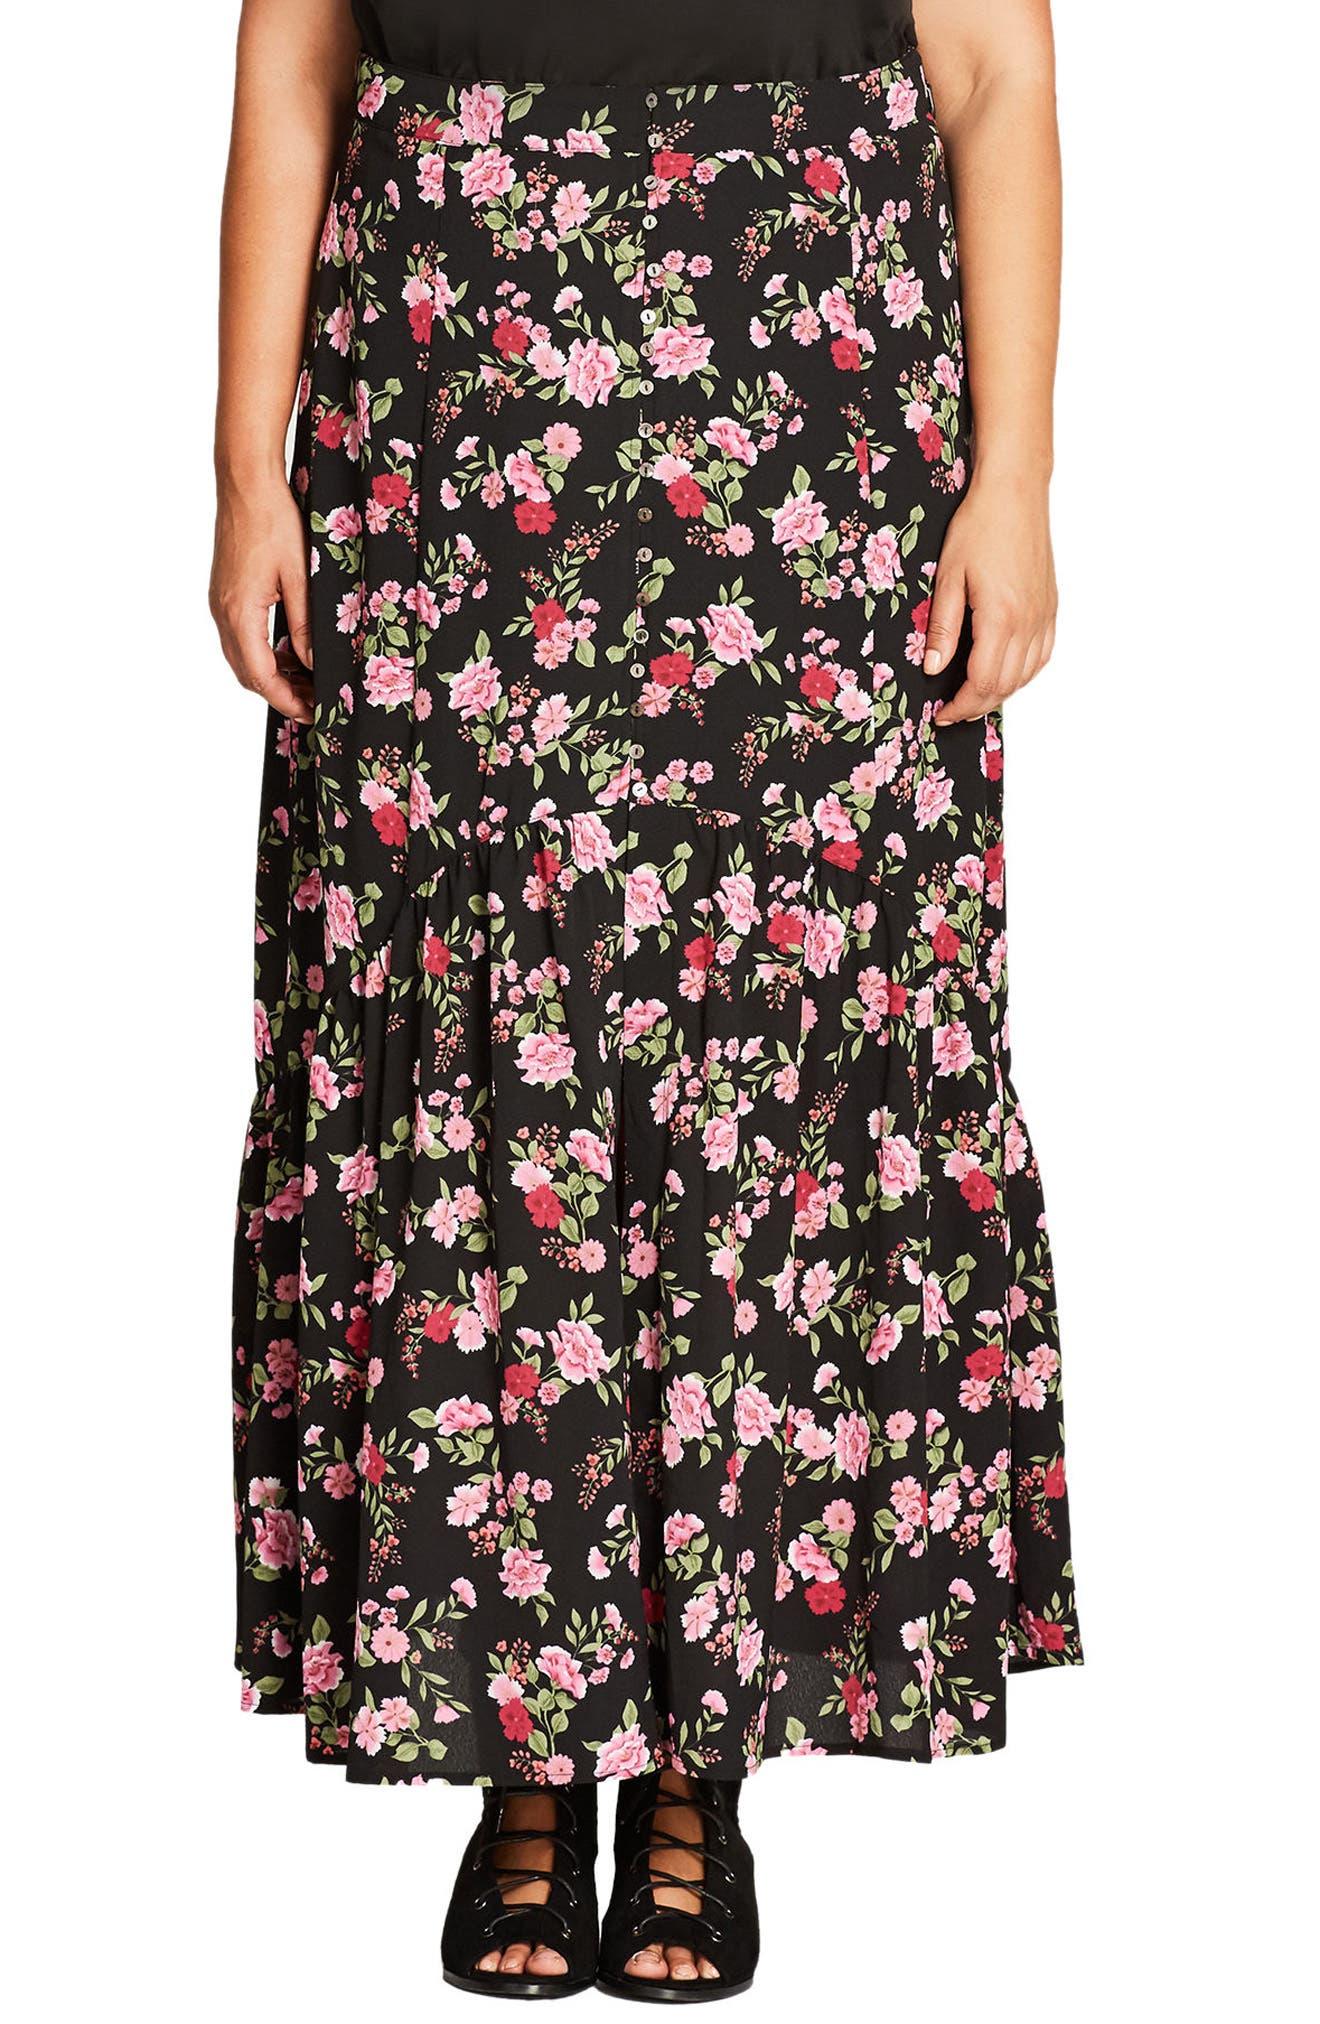 Free Spirit Maxi Skirt,                         Main,                         color, Fuchsia